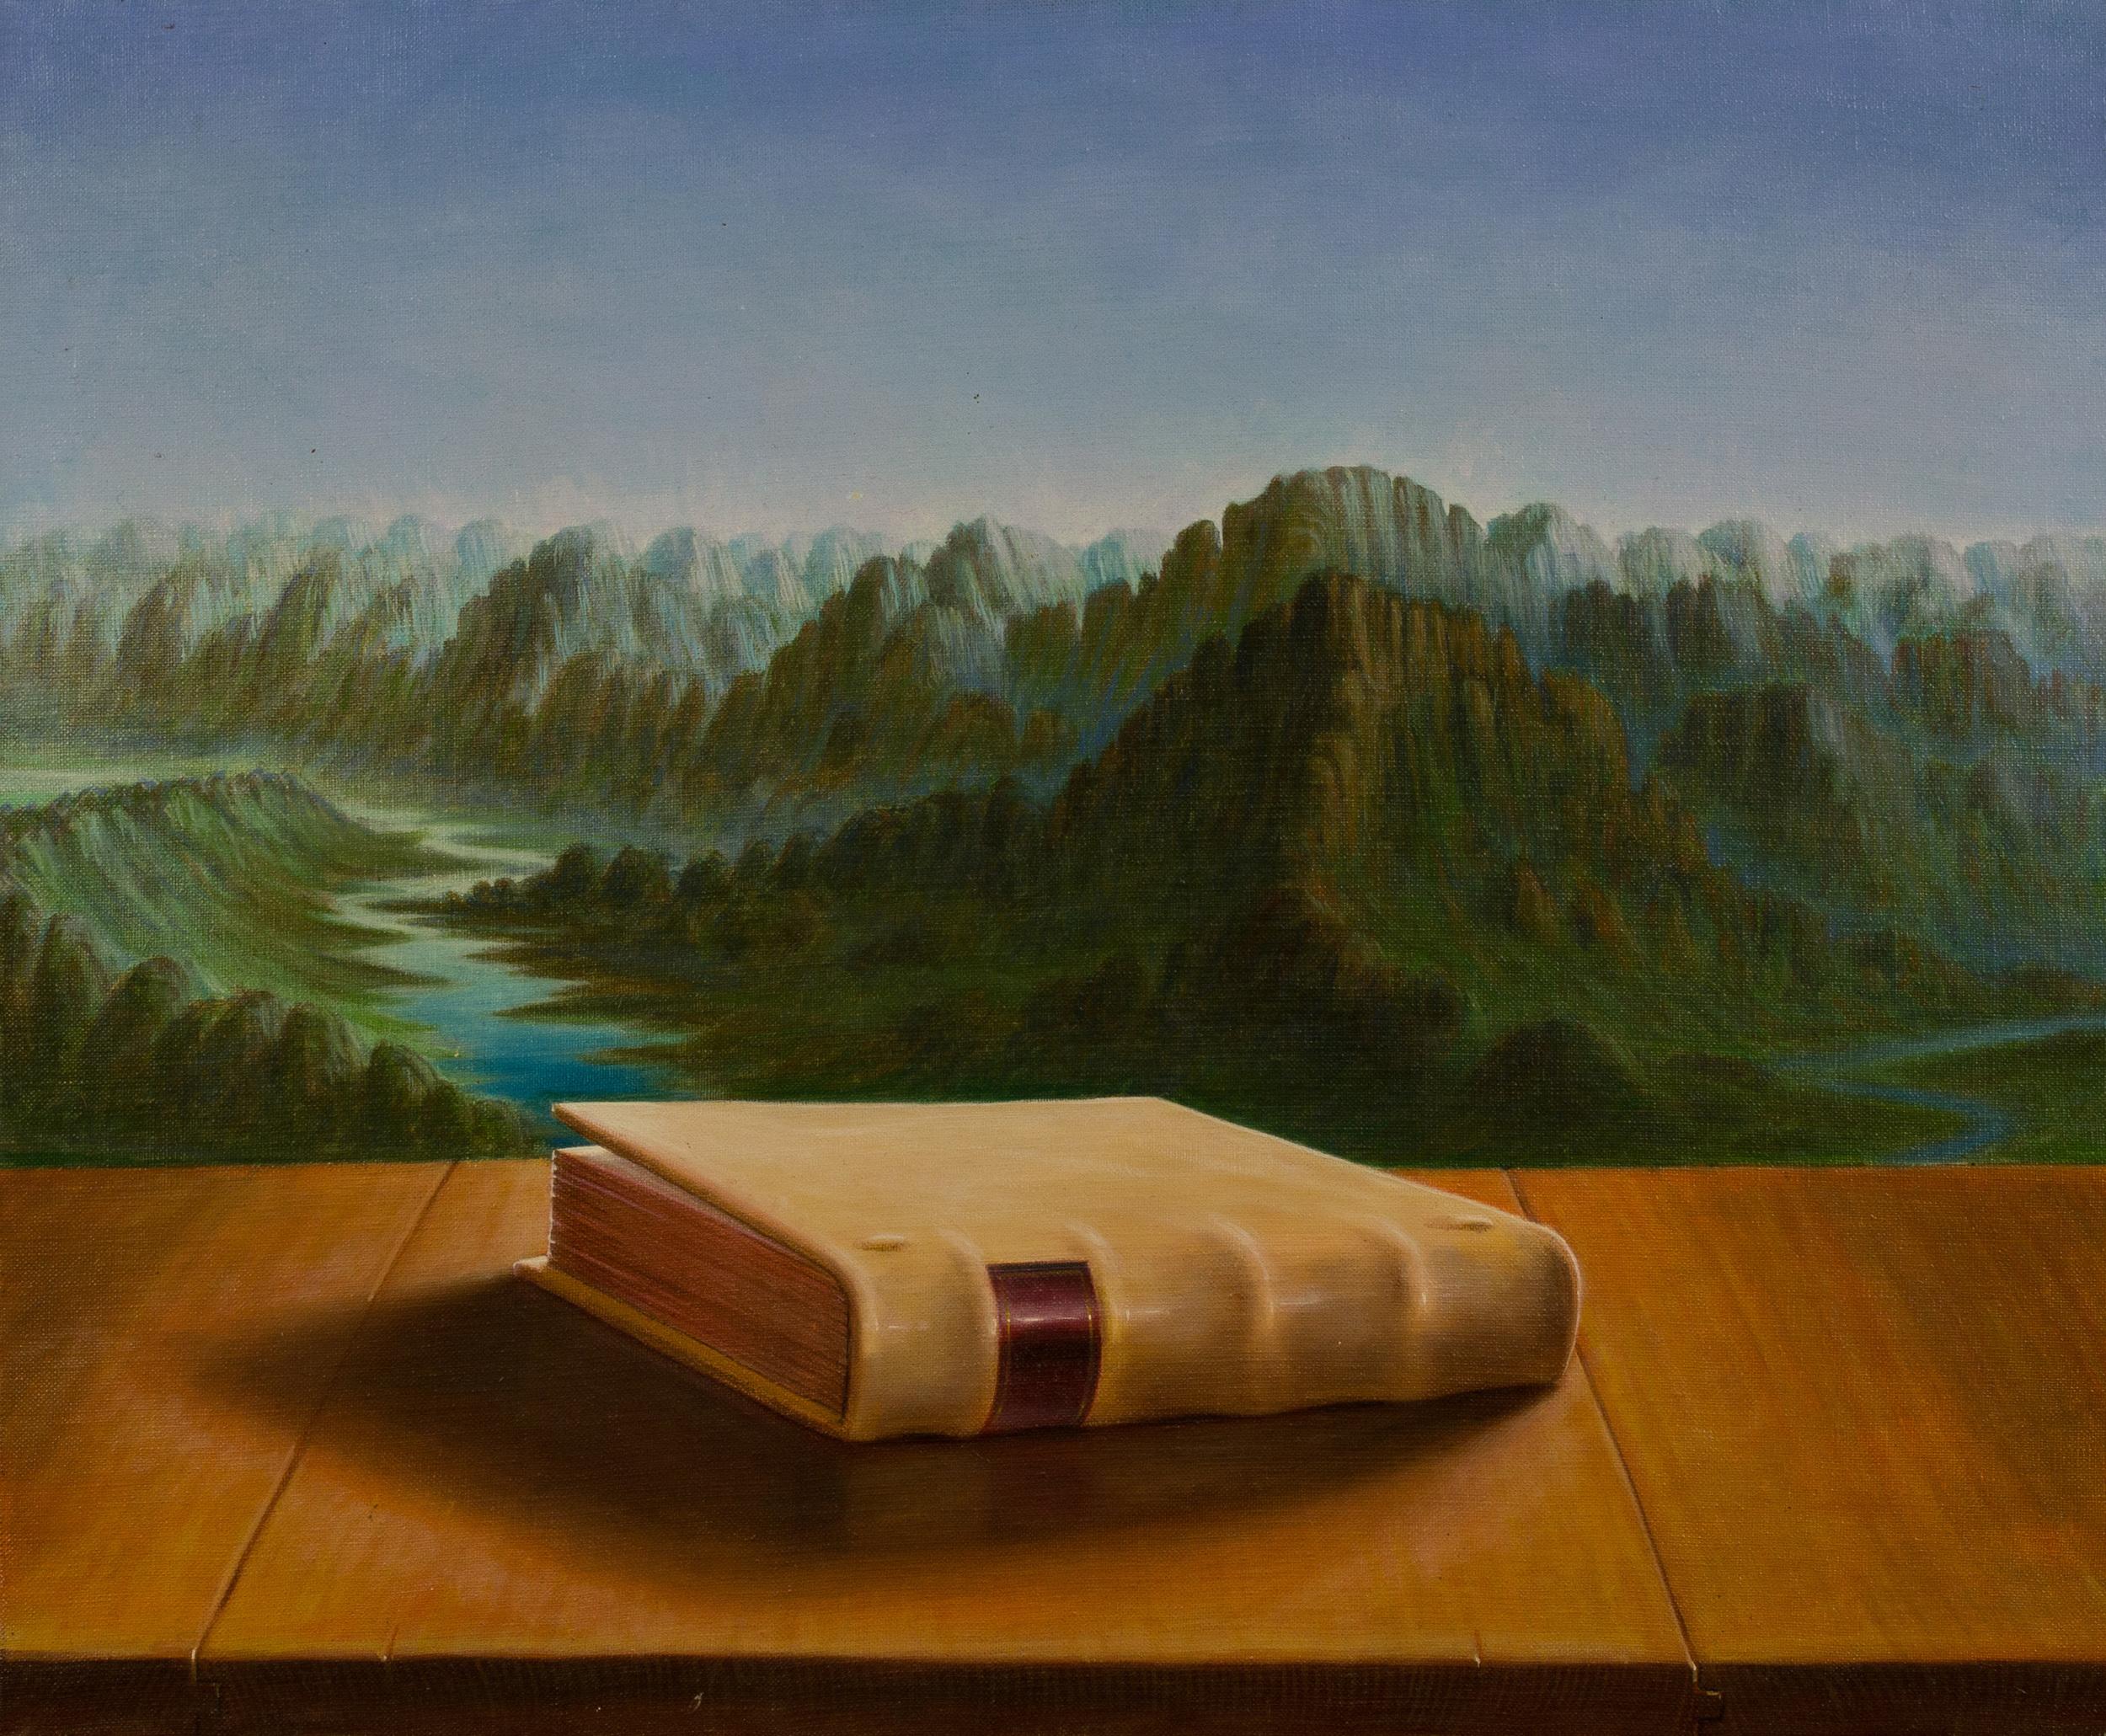 Terra (Ciclo di quattro elementi) , olio su tela, cm 50x60, 1992